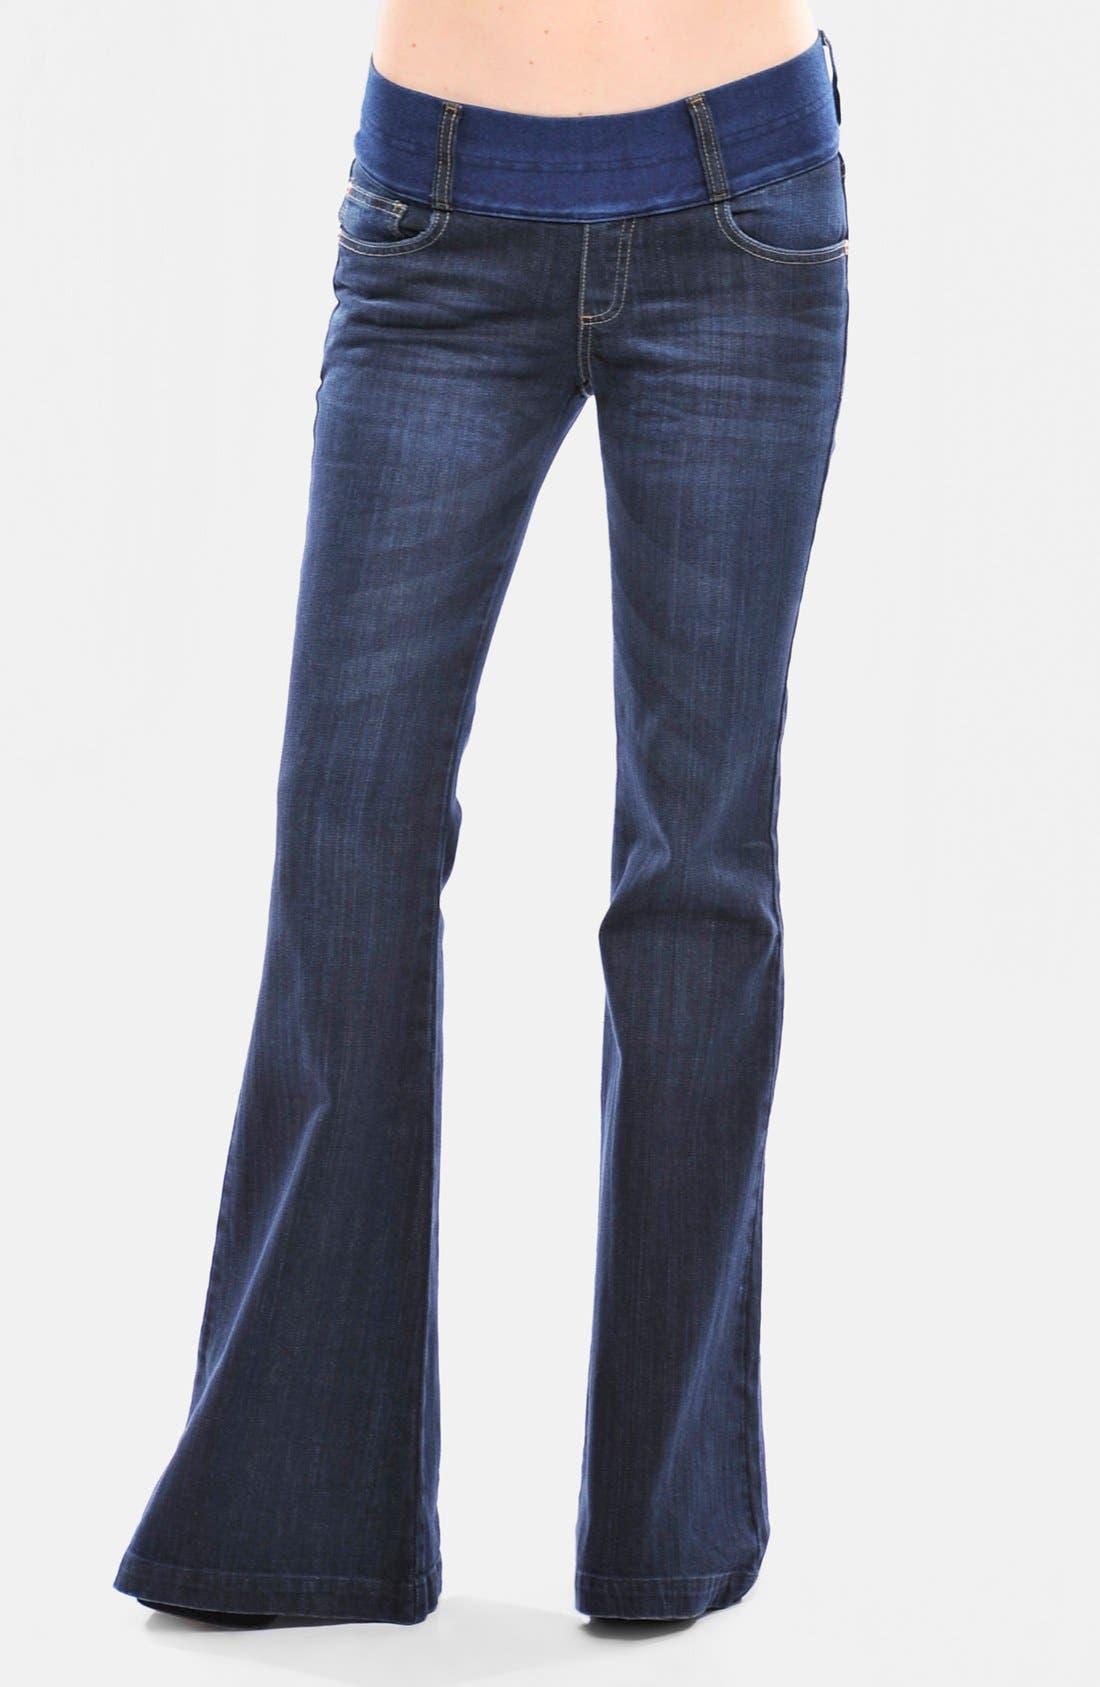 Alternate Image 1 Selected - Olian Flare Maternity Jeans